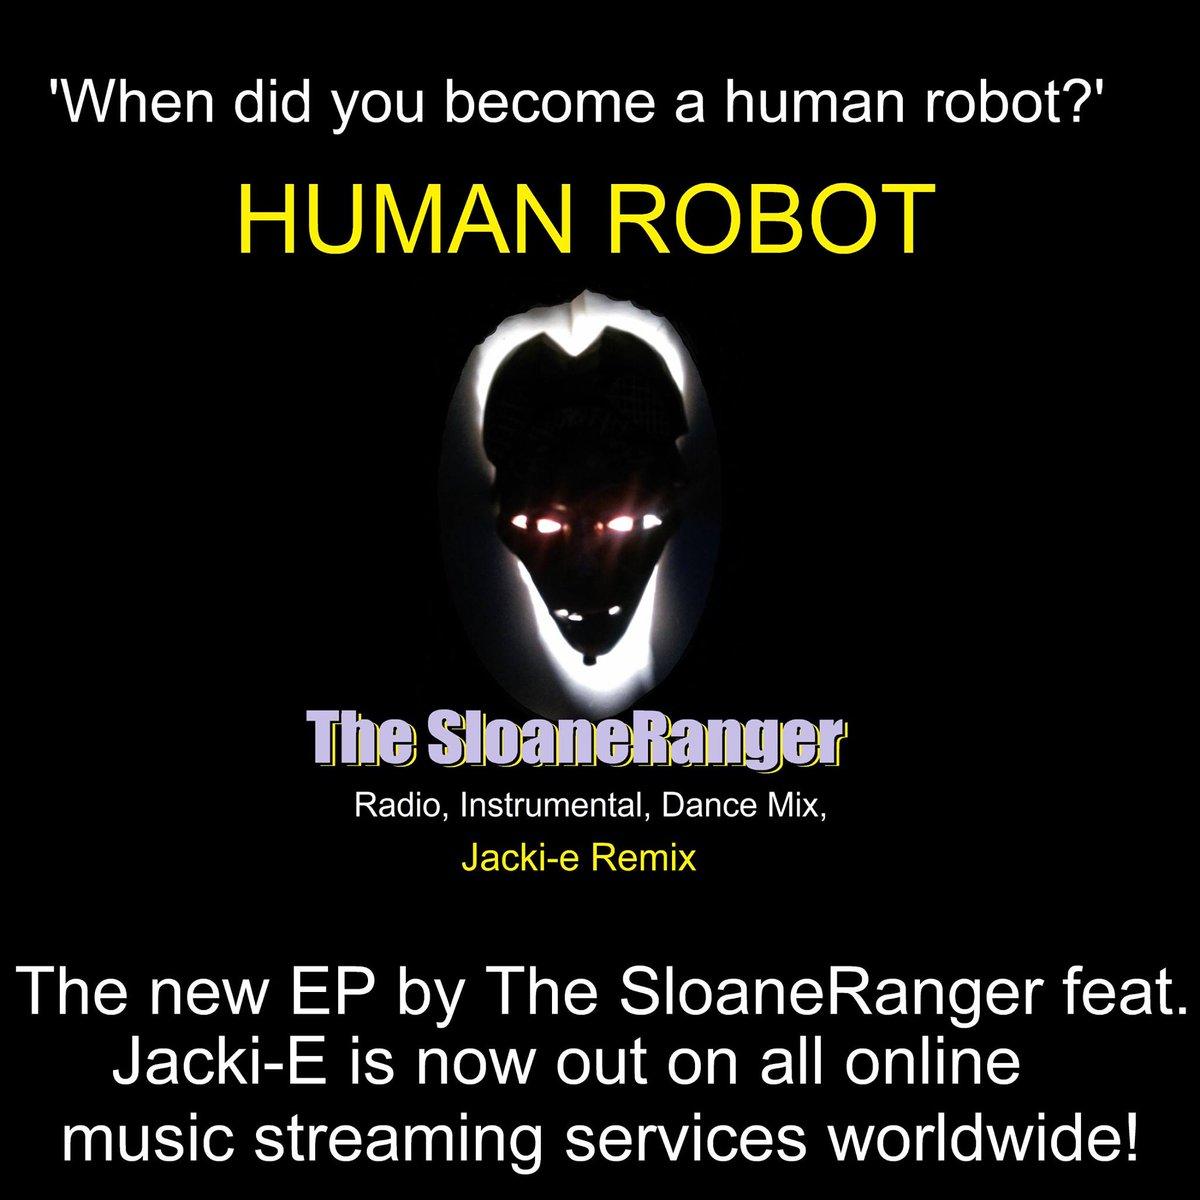 HUMAN ROBOT EP by  @DjSloaneRanger incl my remix out today, Friday, 12 July.  Spotify:-  https:// open.spotify.com/album/6dGtti78 0Djlor4QcquU27  …   Napster:-  https:// gb.napster.com/artist/the-slo aneranger/album/human-robot-ep  …   Apple Music:-   https:// music.apple.com/gb/album/human -robot-ep/1471122730  …   Google Play:-  https:// play.google.com/store/music/al bum?id=Bo5zokgpfimf6mvd6sjsc3xazim&tid=song-Tohtr5lxh7dfmbxgg6fj2lx7phy&hl=en  …   Amazon:-  https://www. amazon.co.uk/Human-Robot-EP -SloaneRanger/dp/B07TZ22997/ref=sr_1_2?keywords=human+robot&qid=1562952894&s=gateway&sr=8-2  …   #techno #techhouse <br>http://pic.twitter.com/IIDfiO8O8W